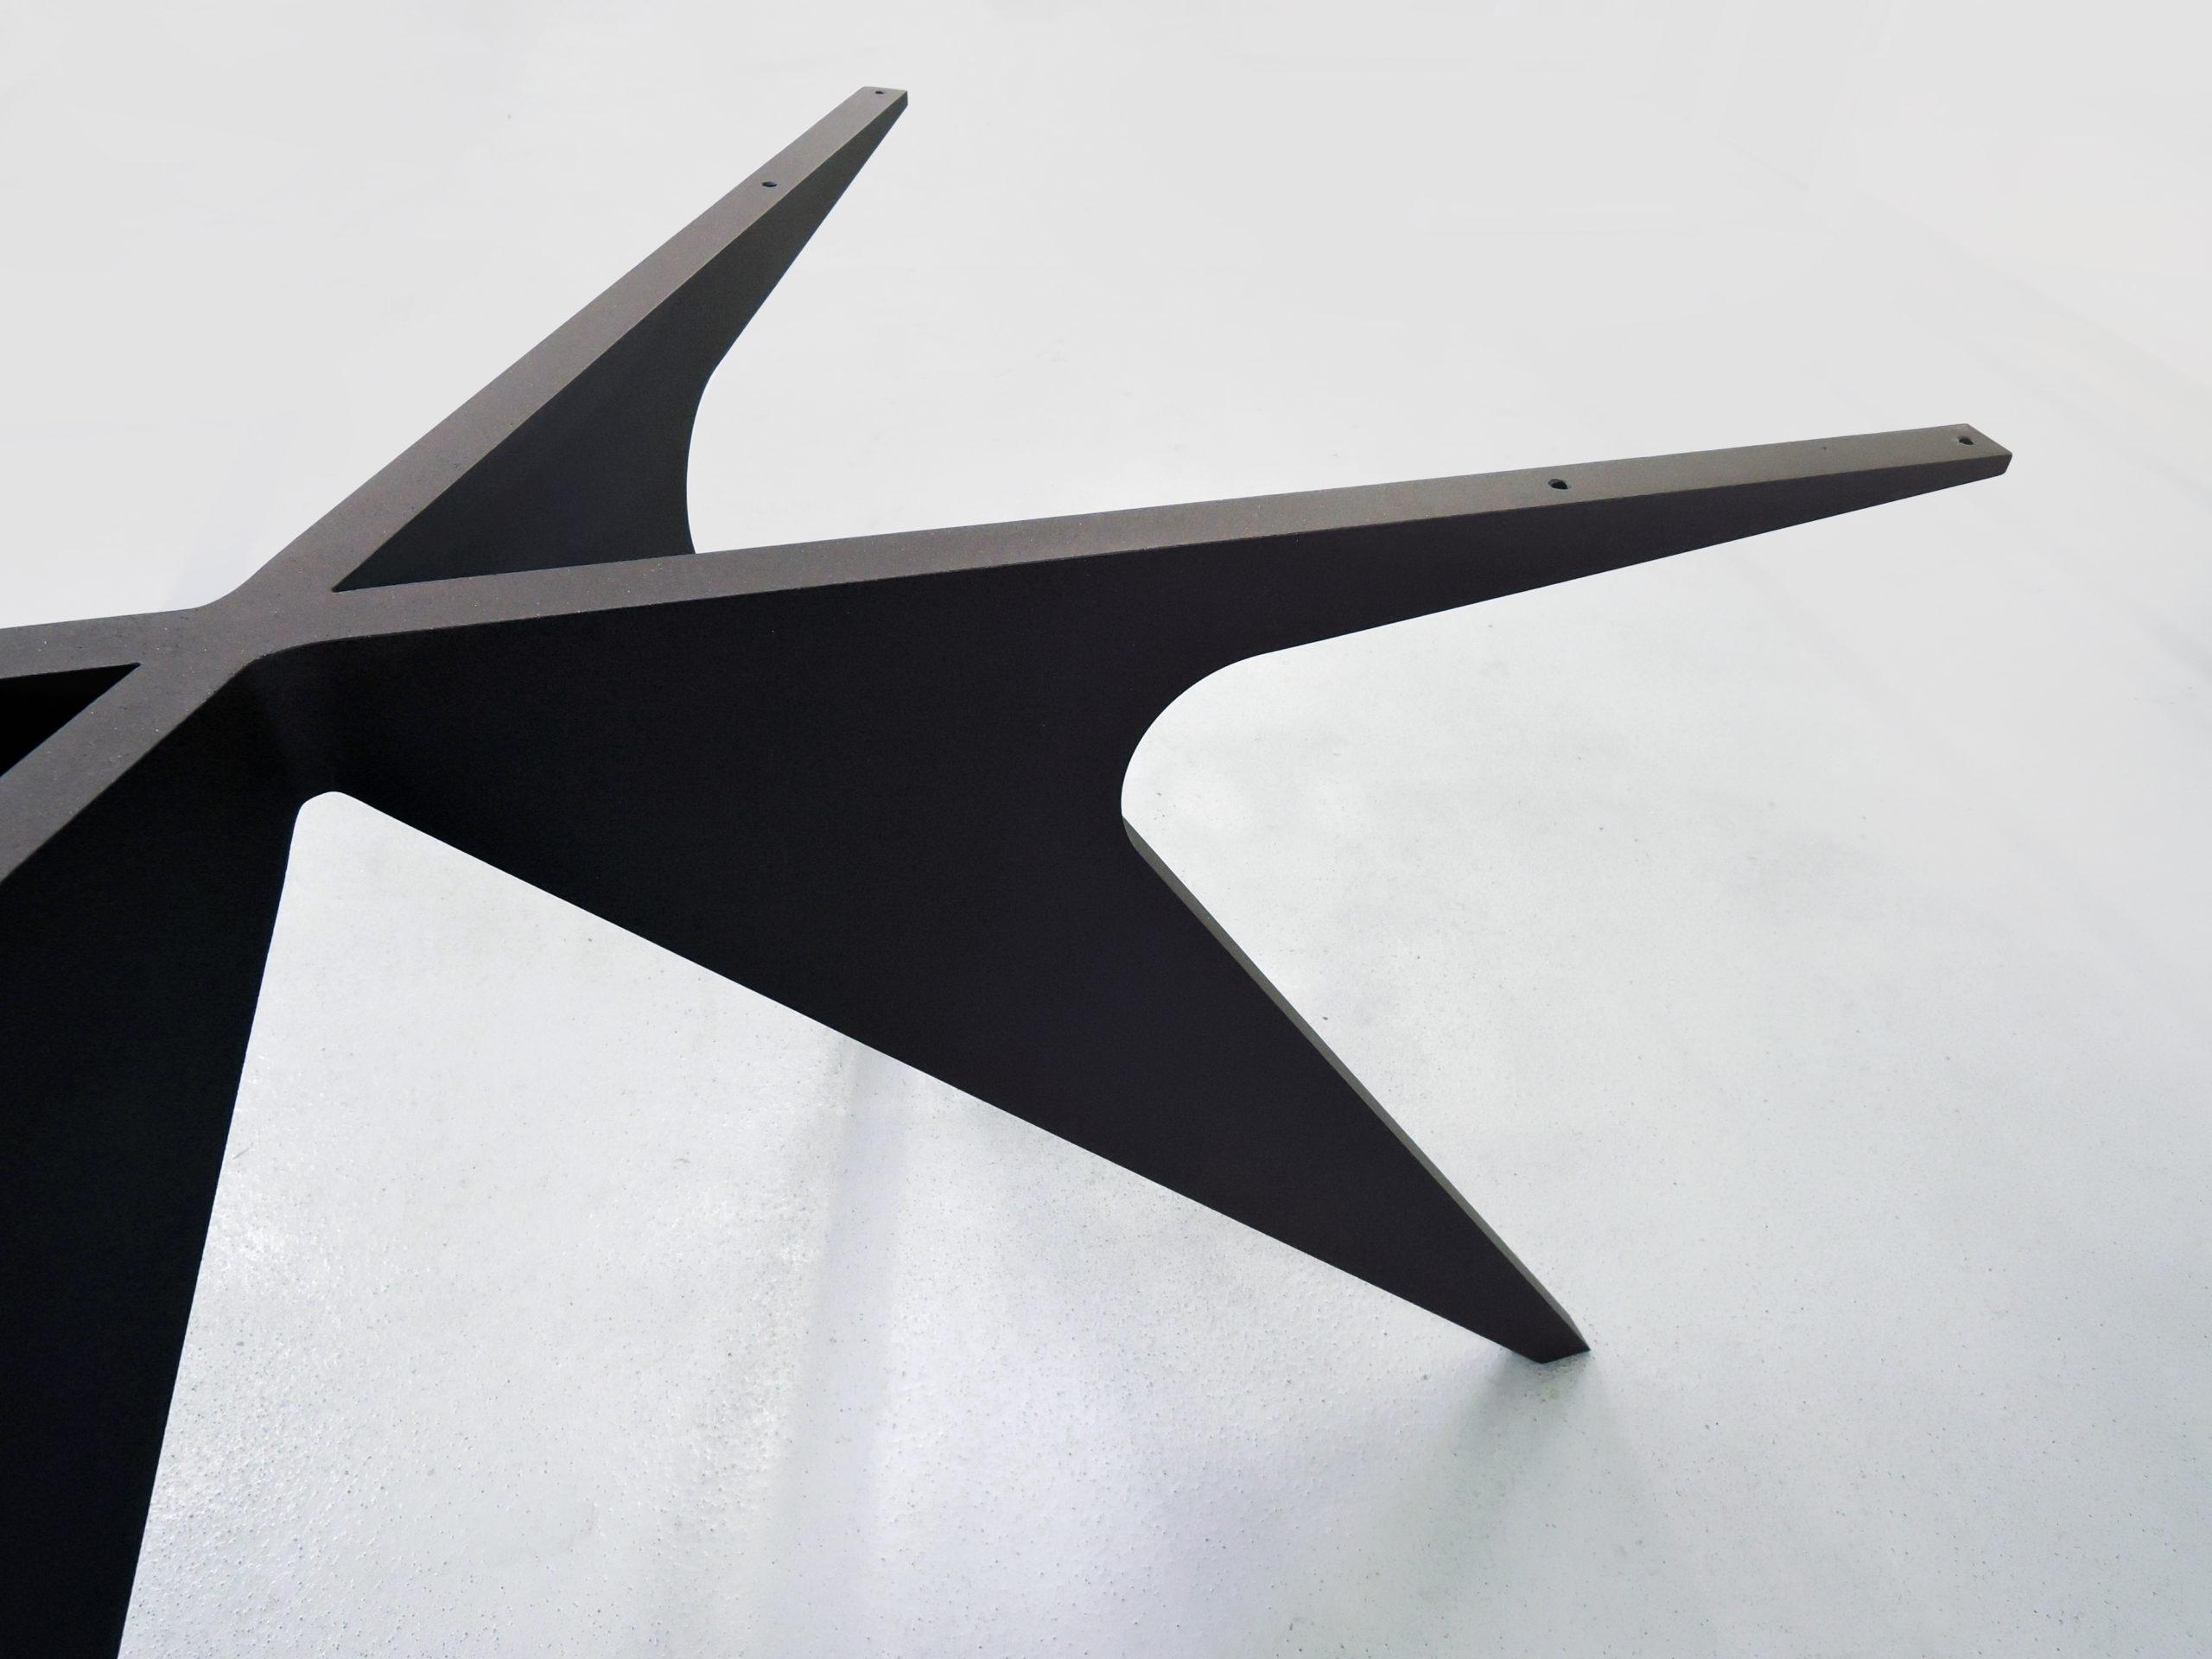 ARTMETA / pied de table Méduse sur mesure en aluminium pleine masse